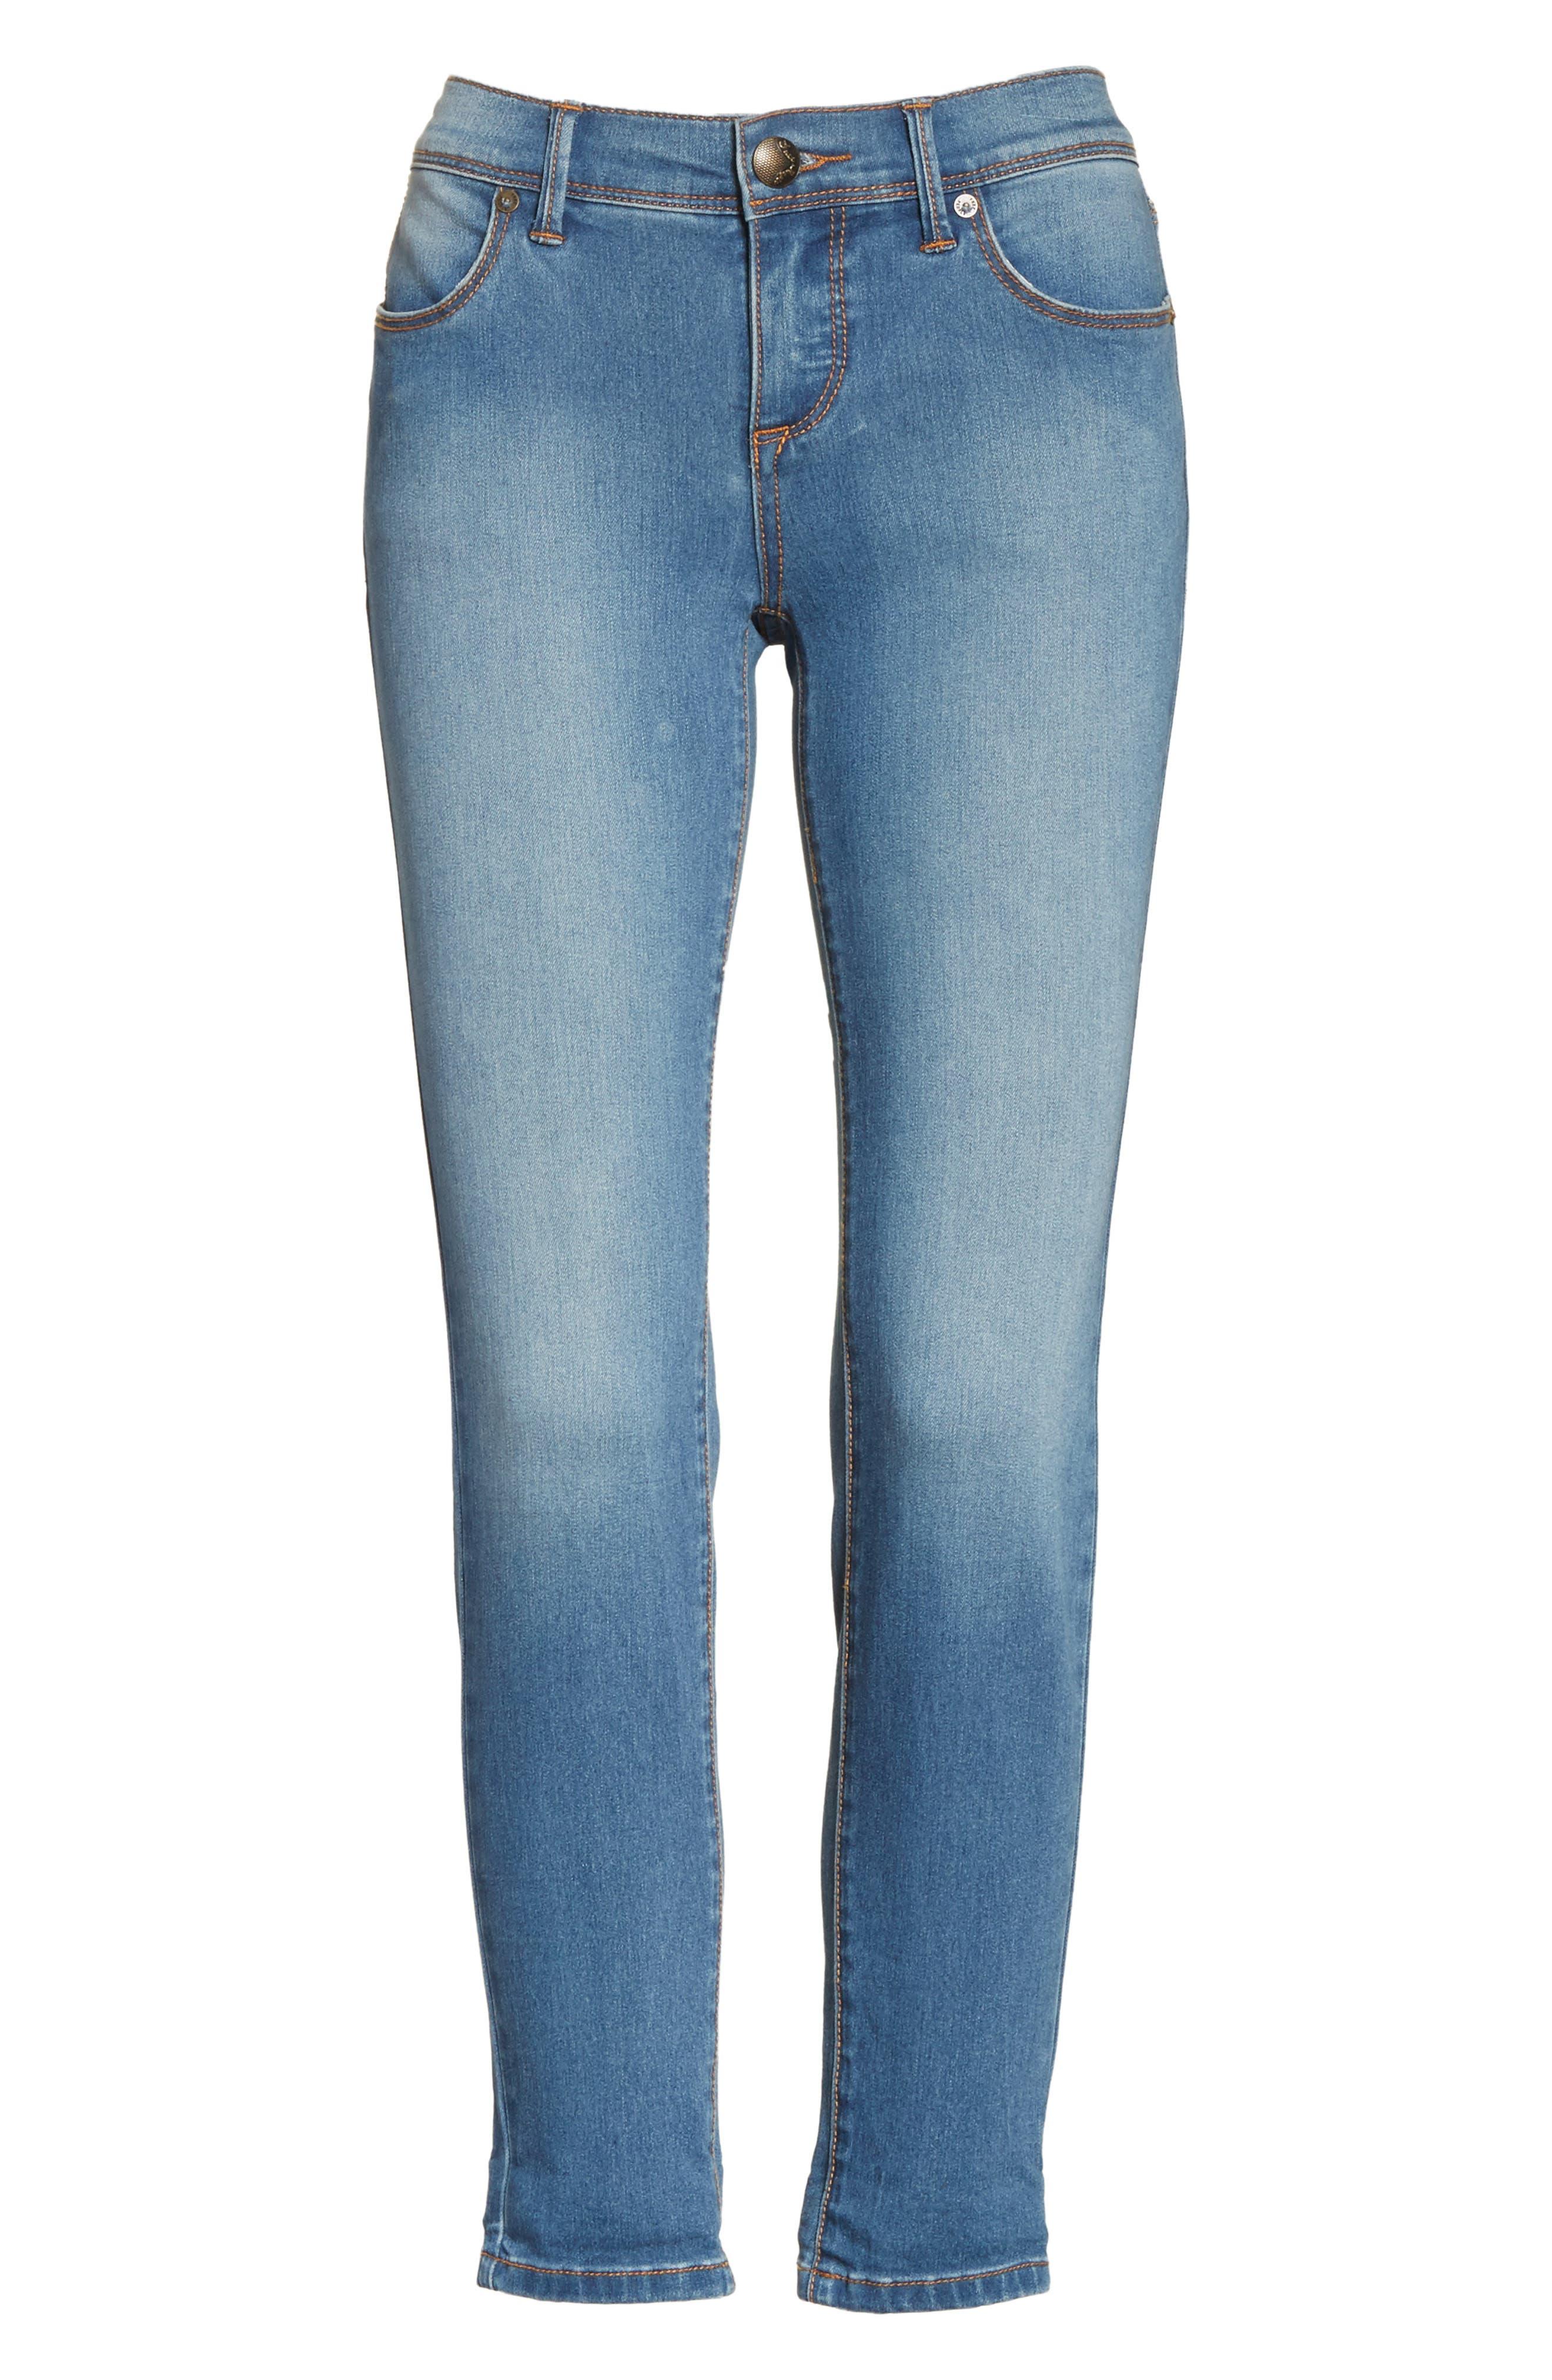 Gummy High Waist Jeans,                             Main thumbnail 1, color,                             Light Denim